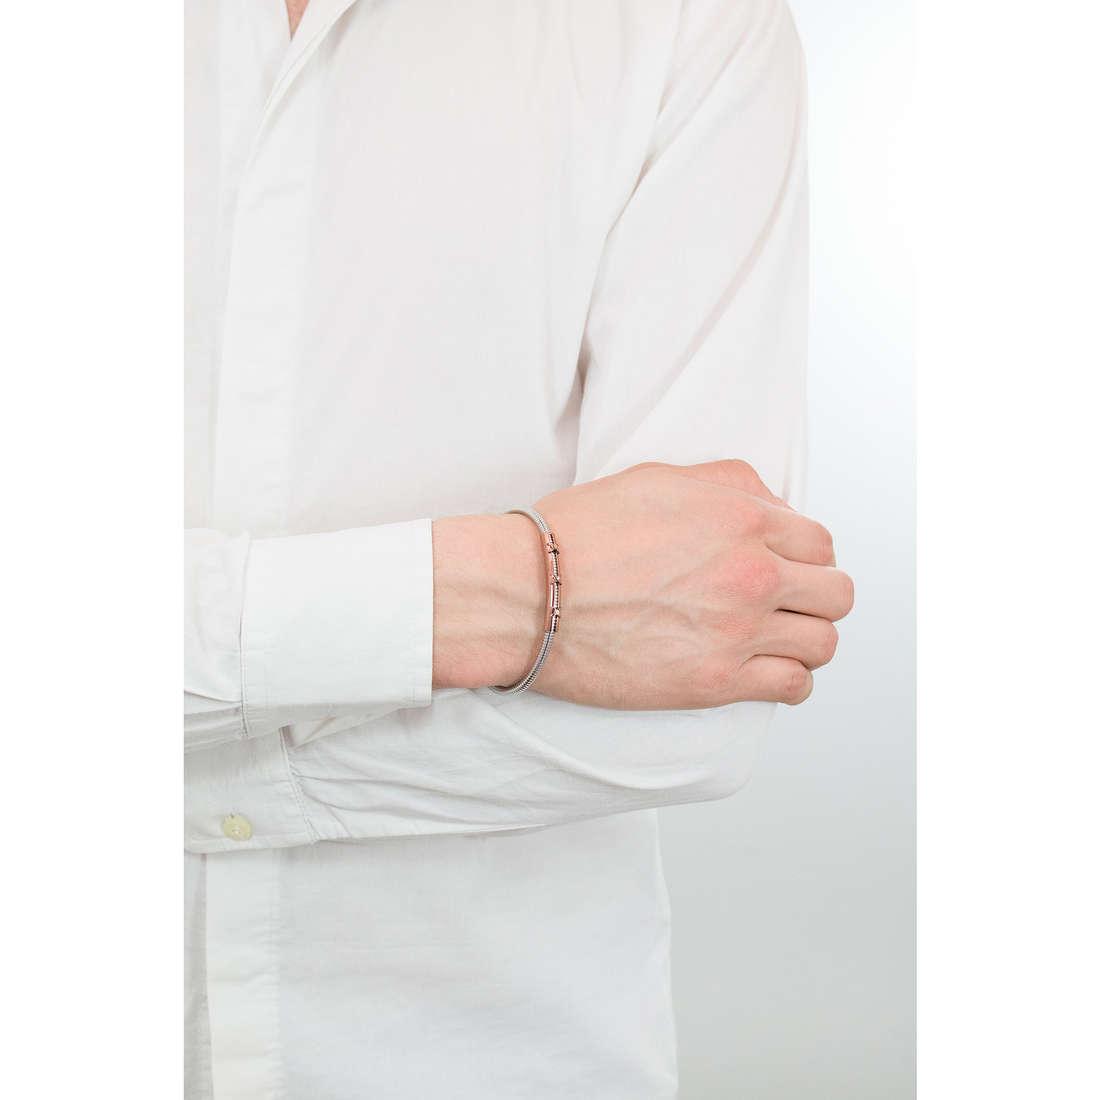 Comete bracciali Boxe uomo UBR 794 indosso